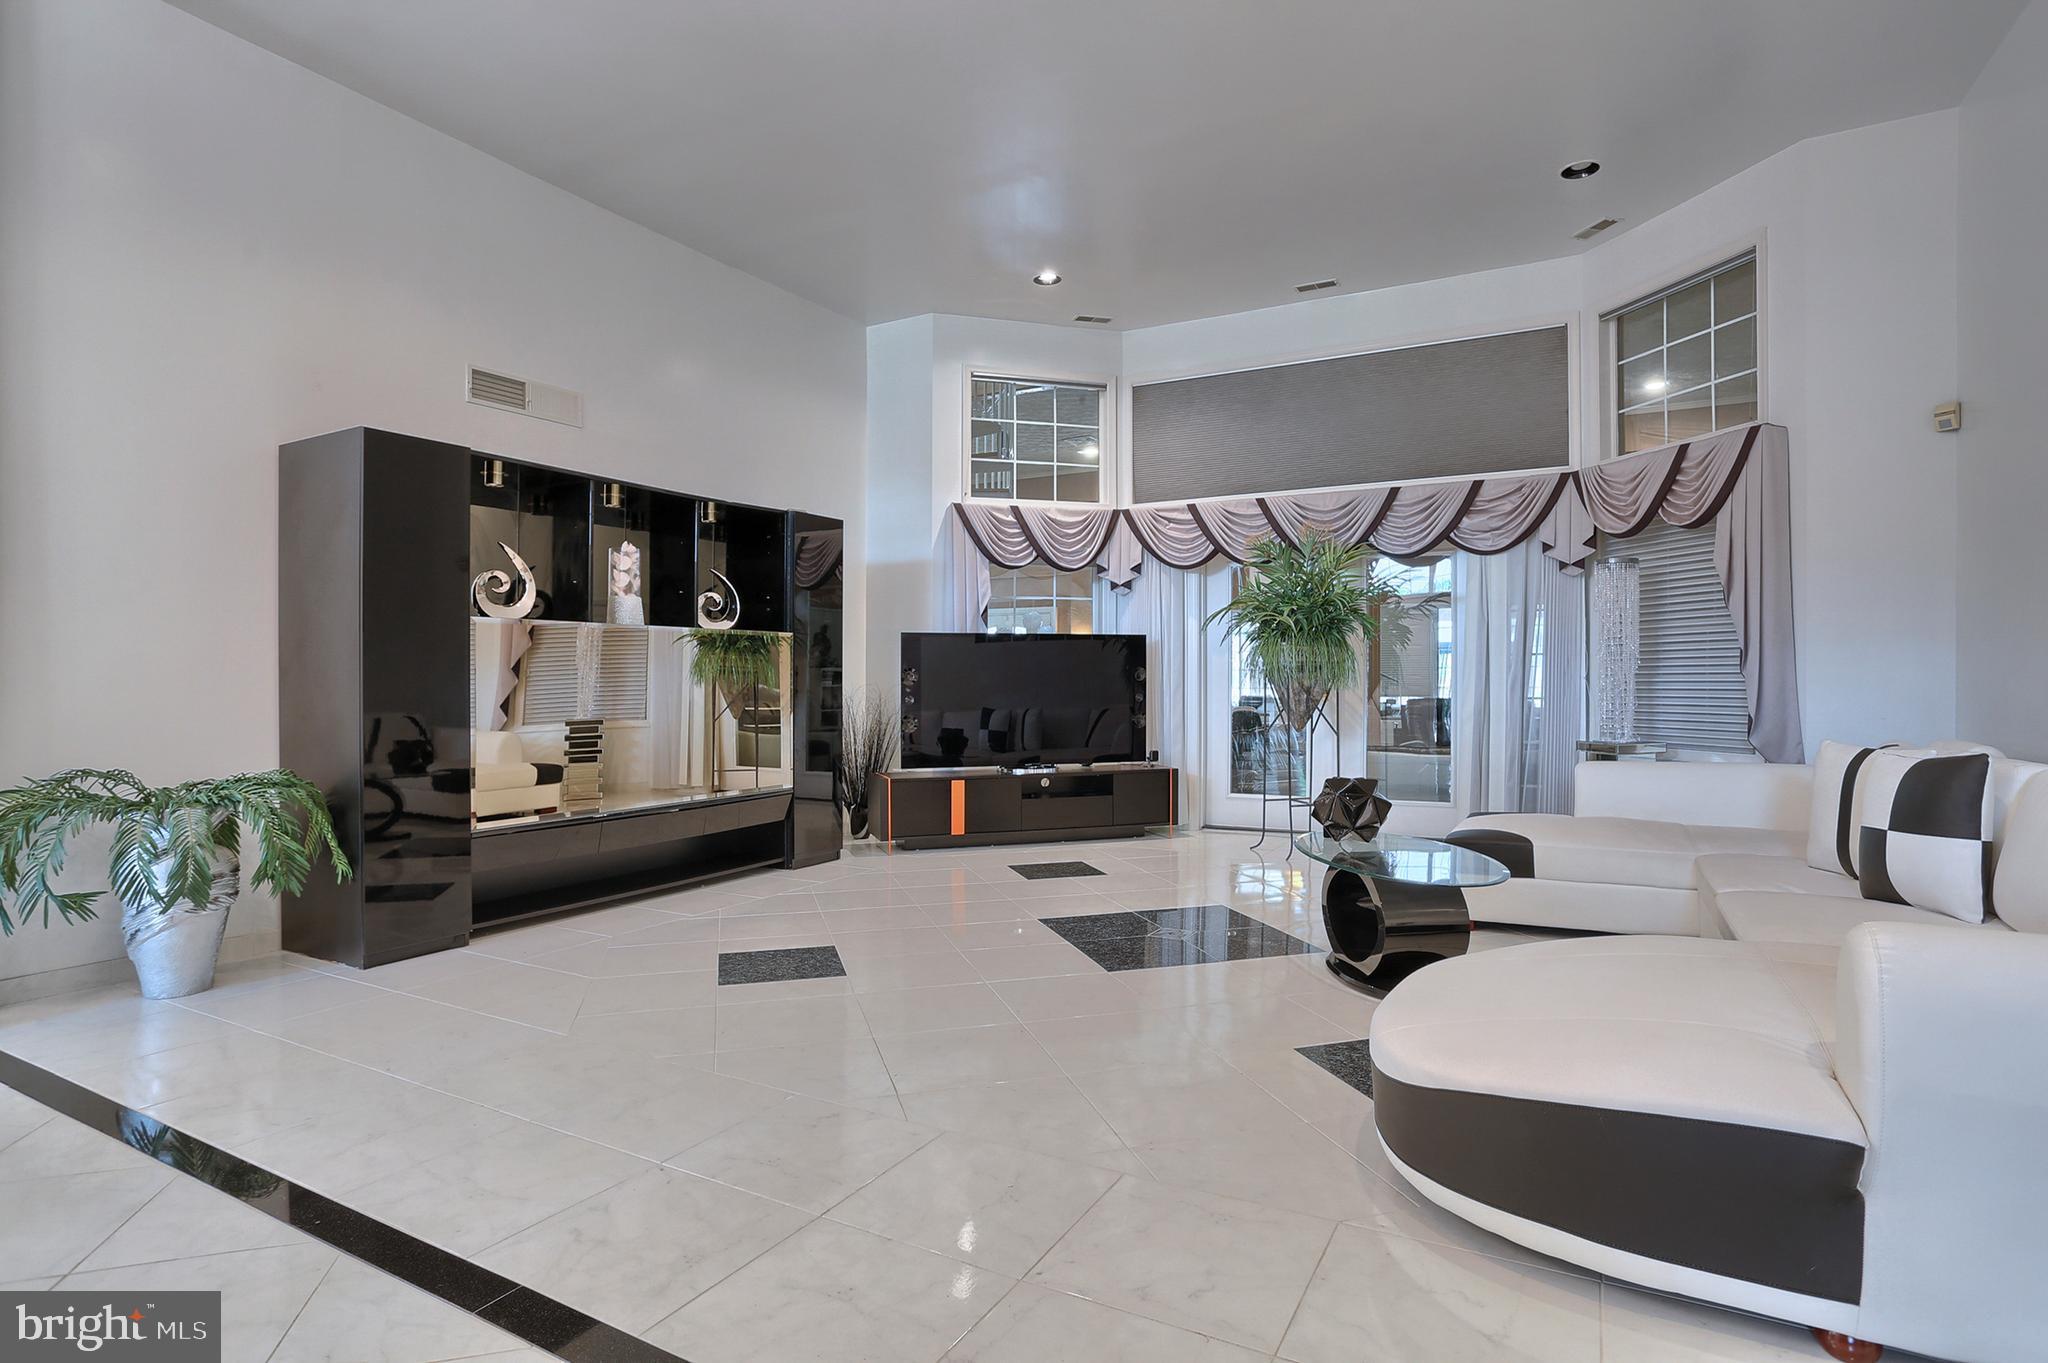 19' x 20' formal living room